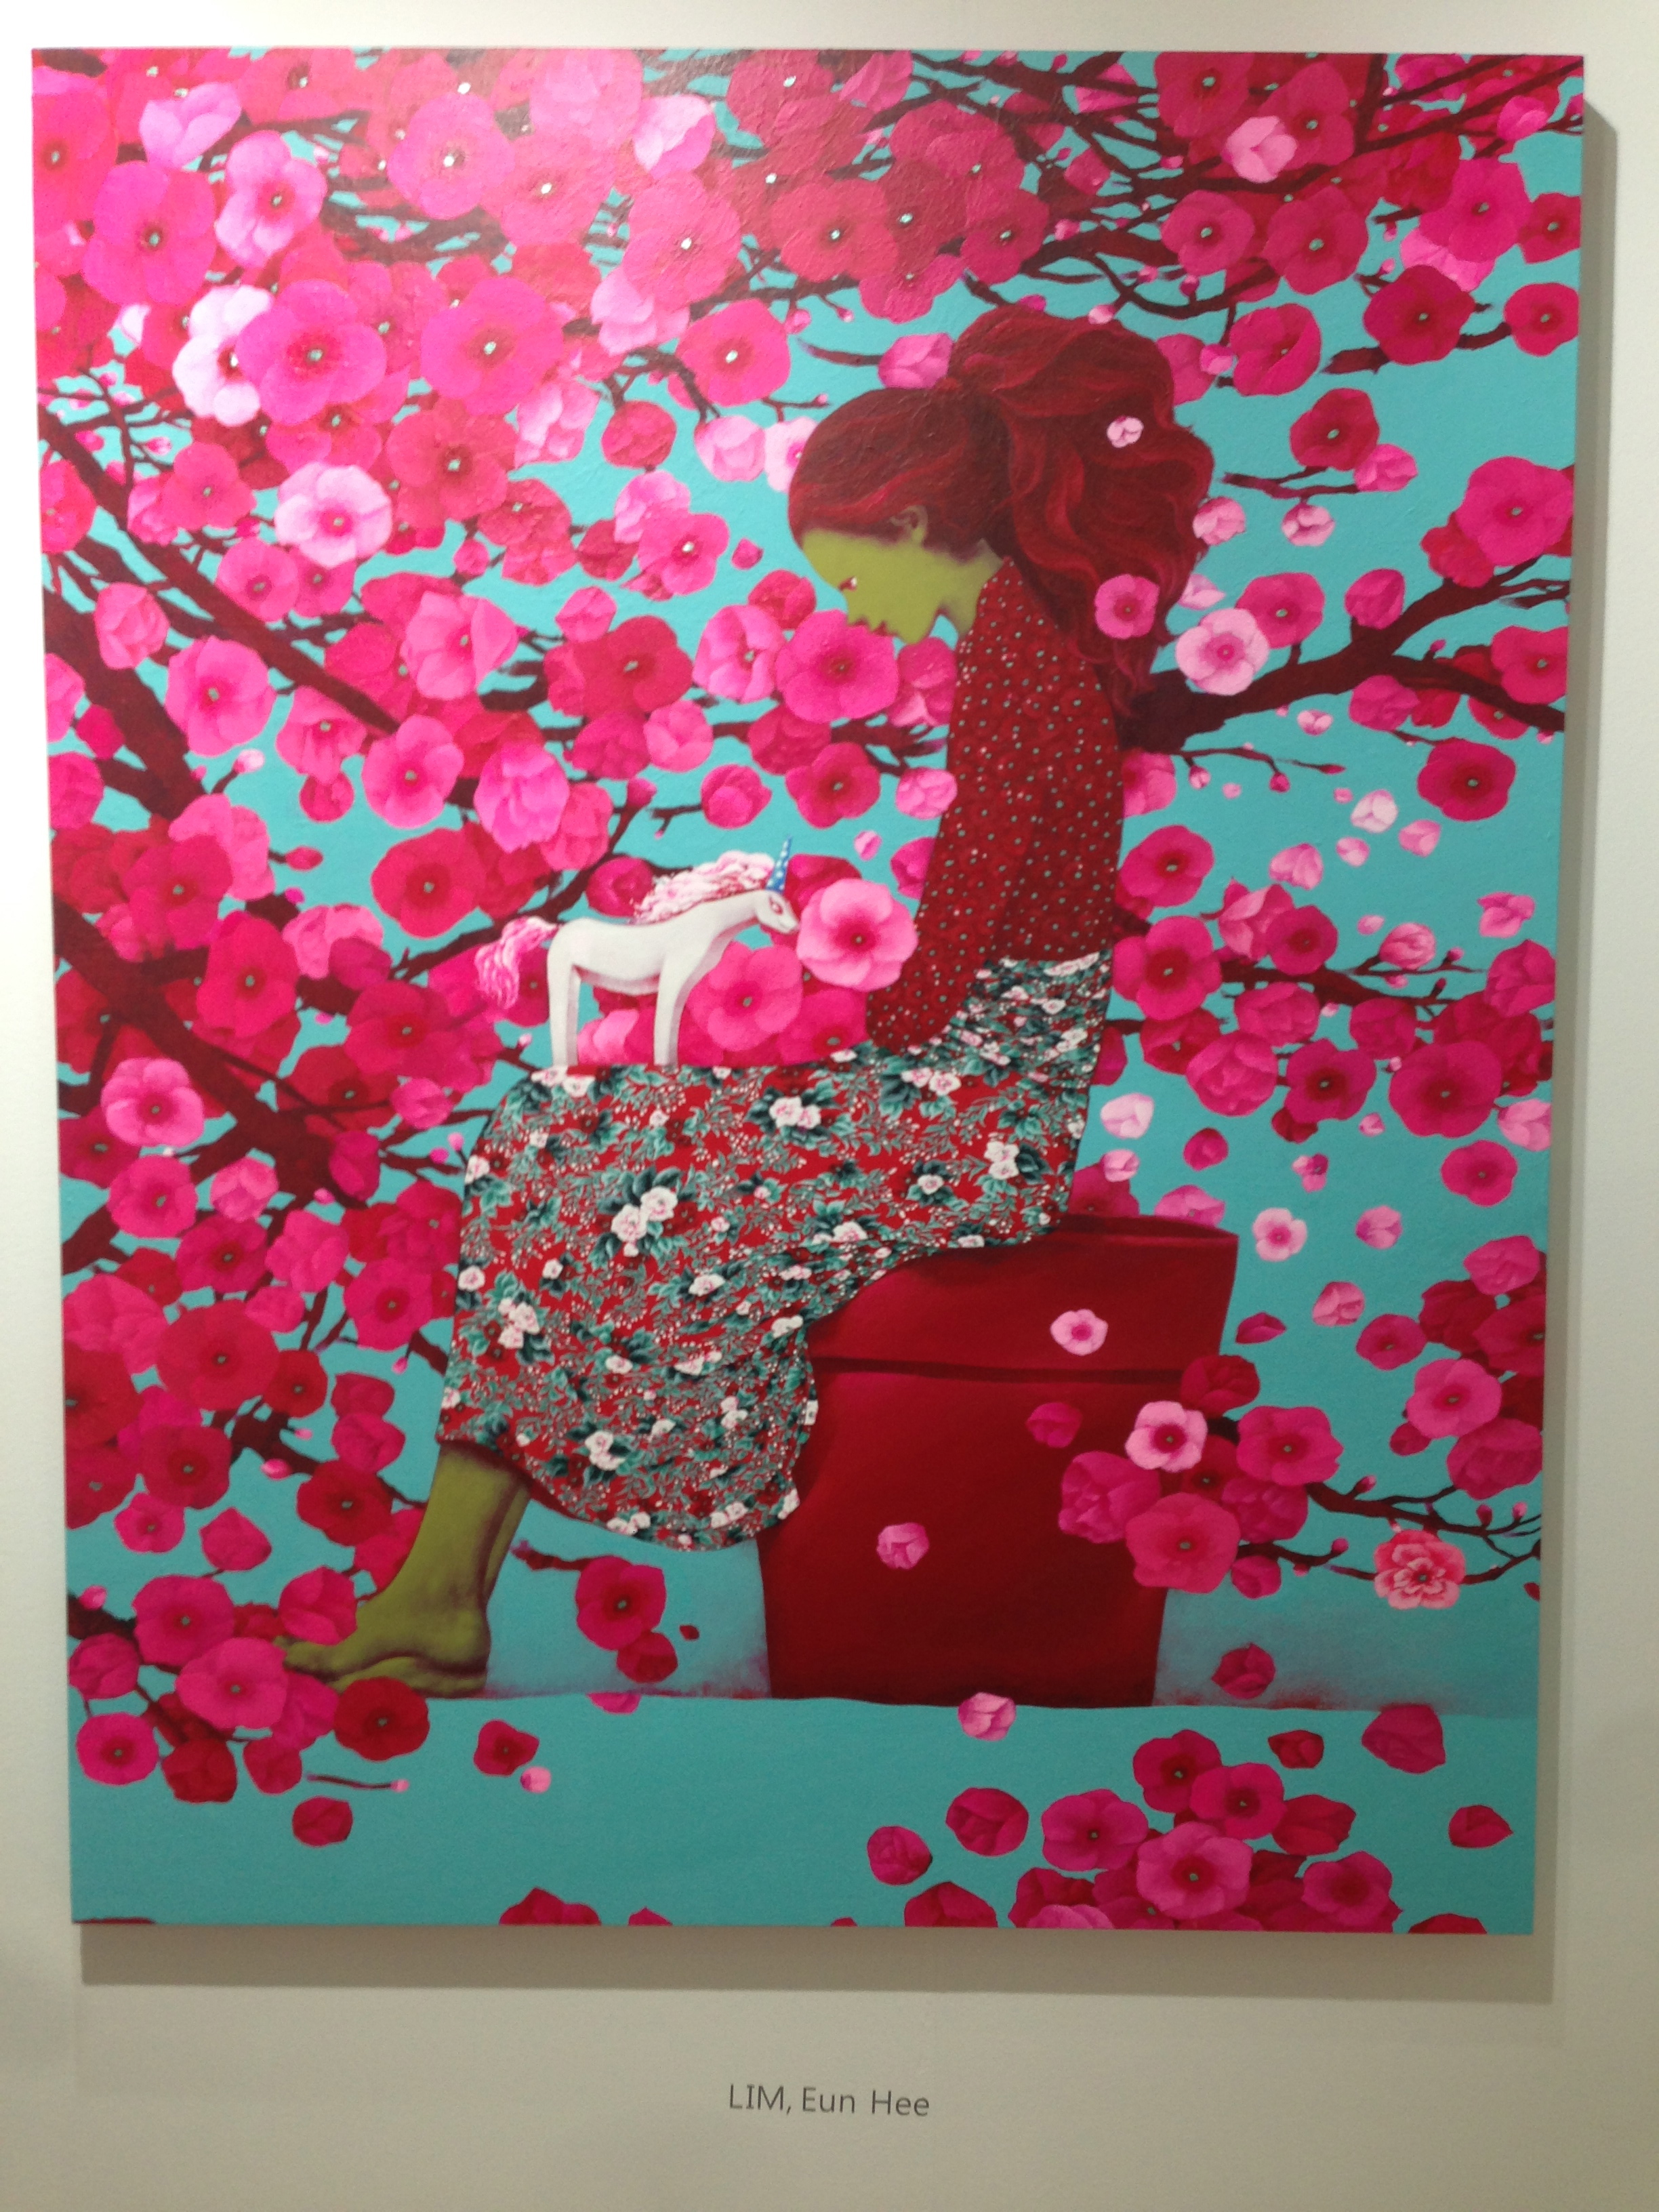 by Lim Eun Hee